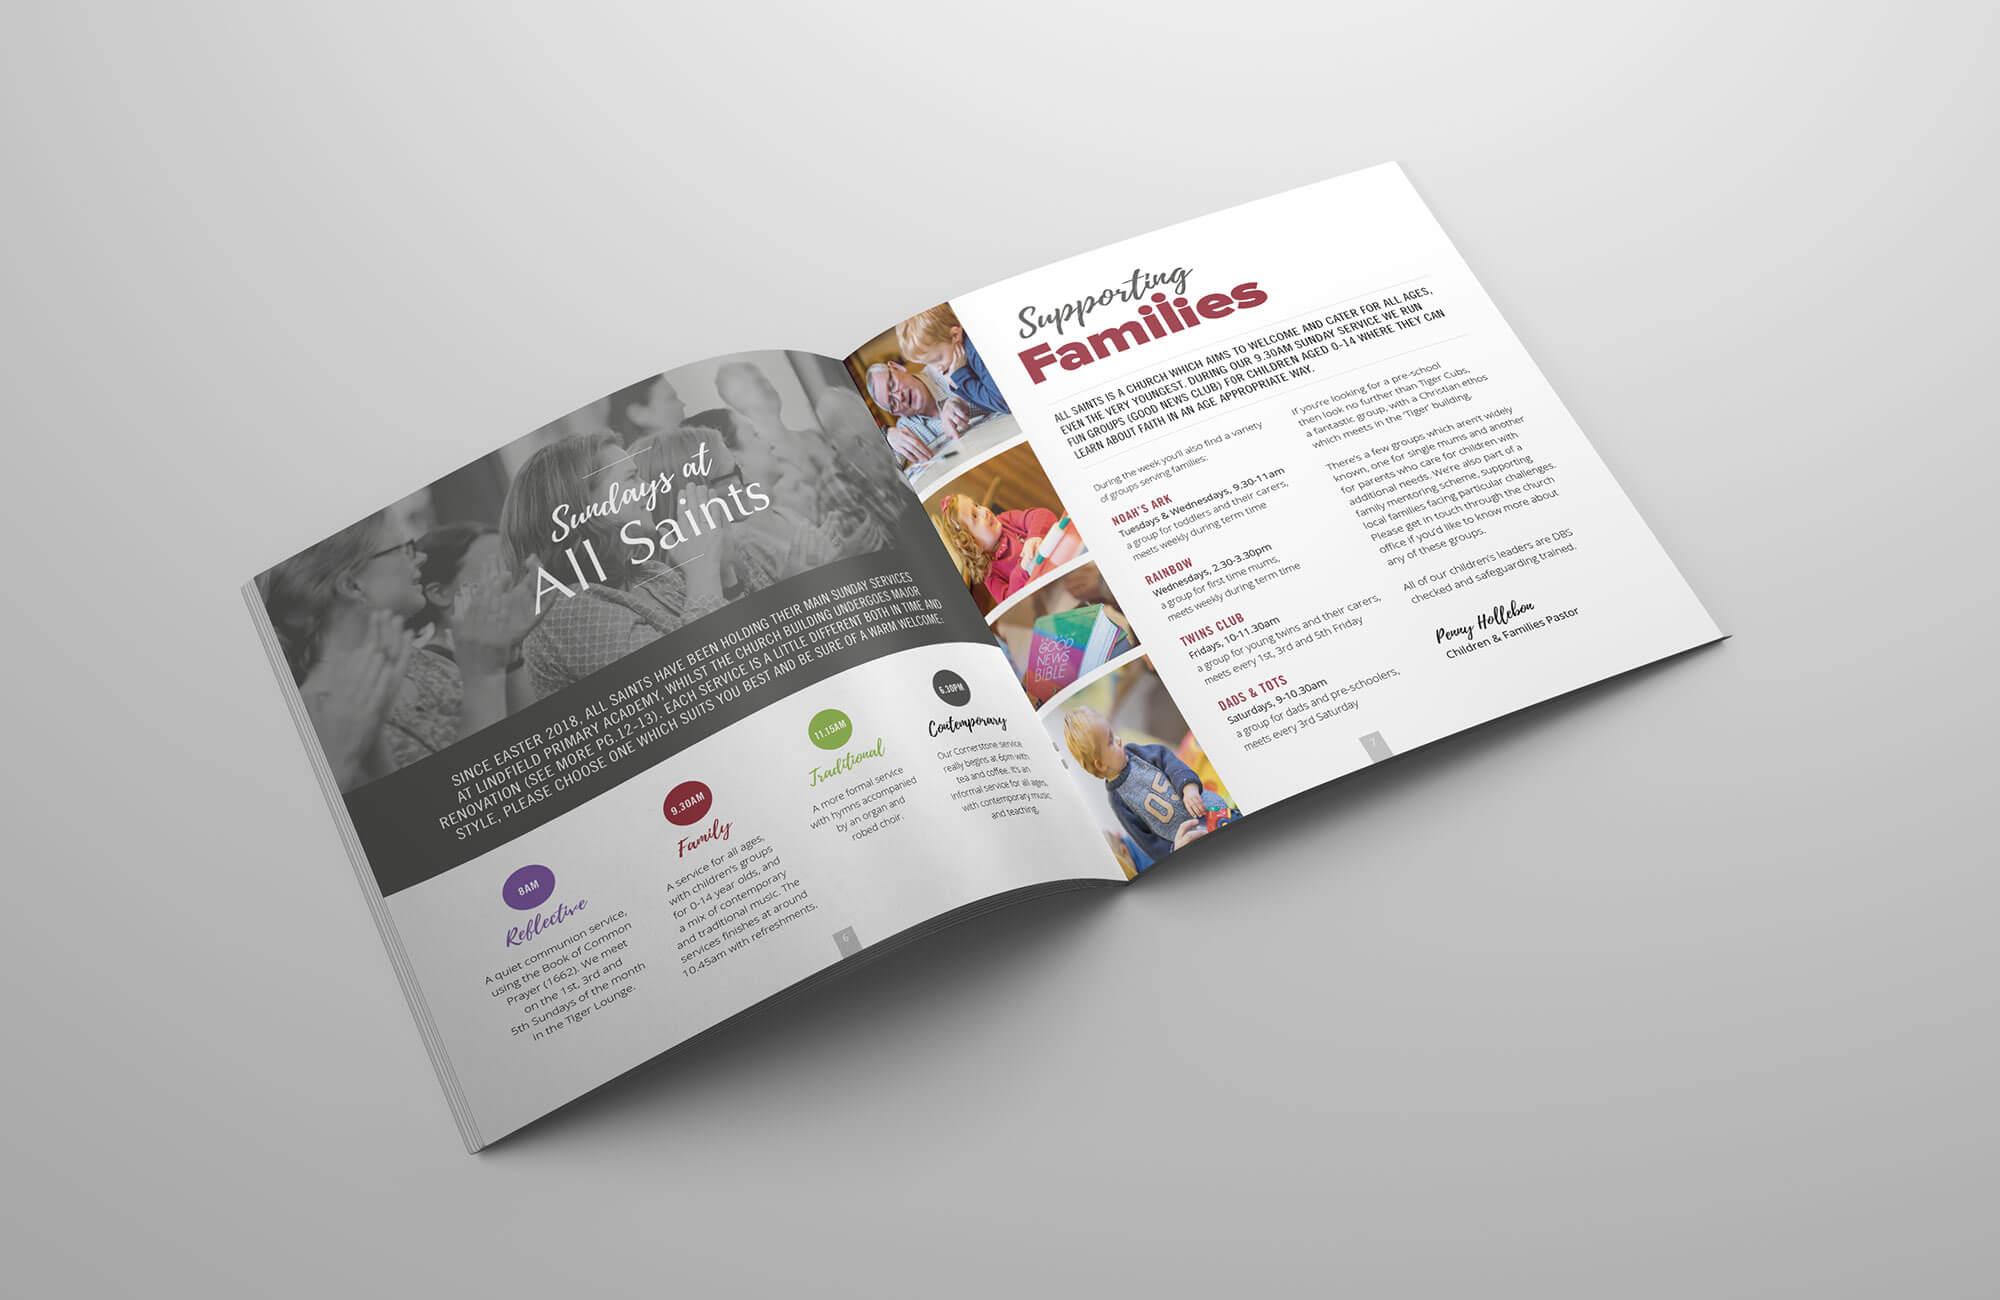 All Saints Church Community Magazine Design